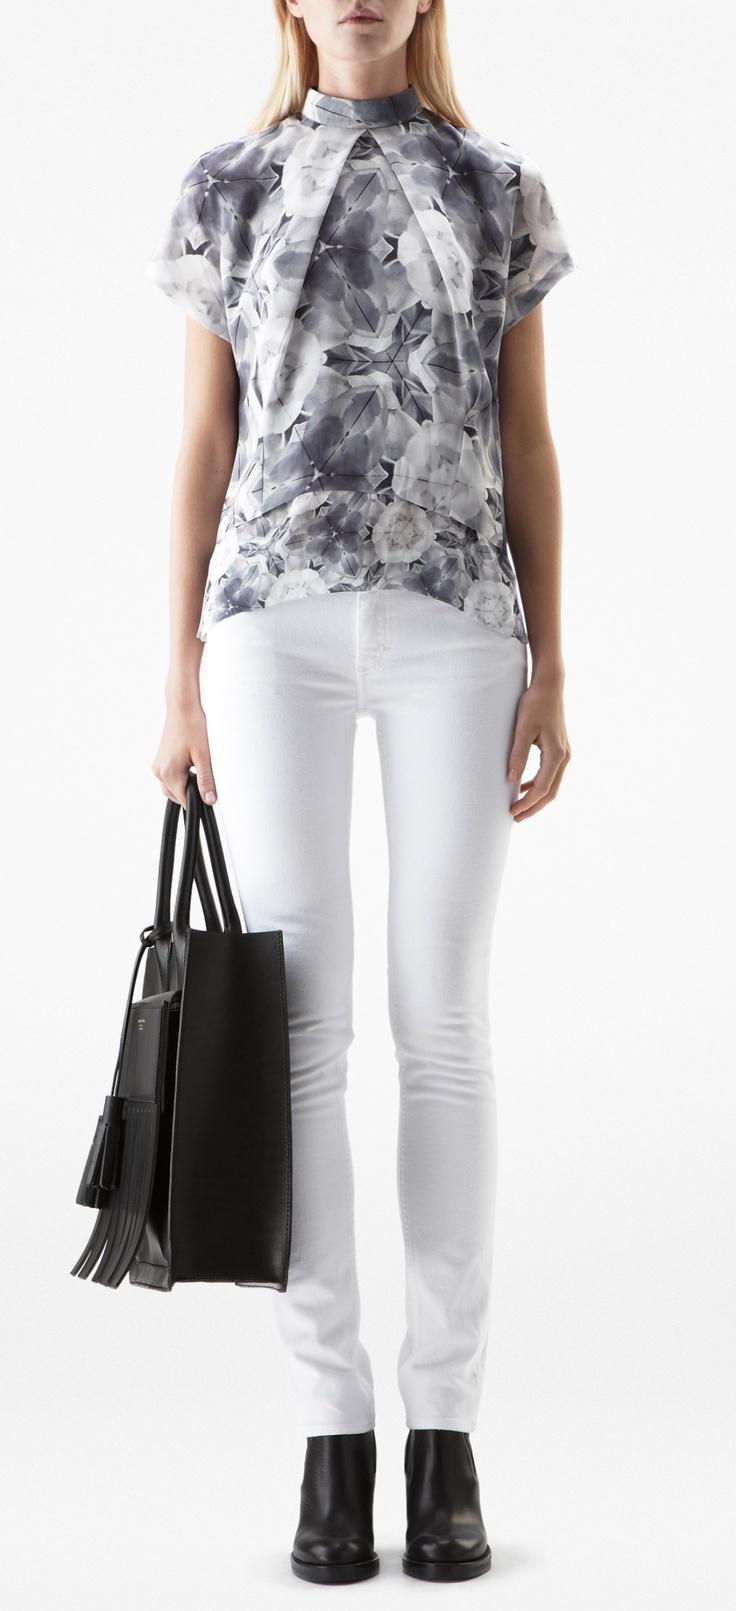 Sweet Print Kaleidoscope blouse by Acne